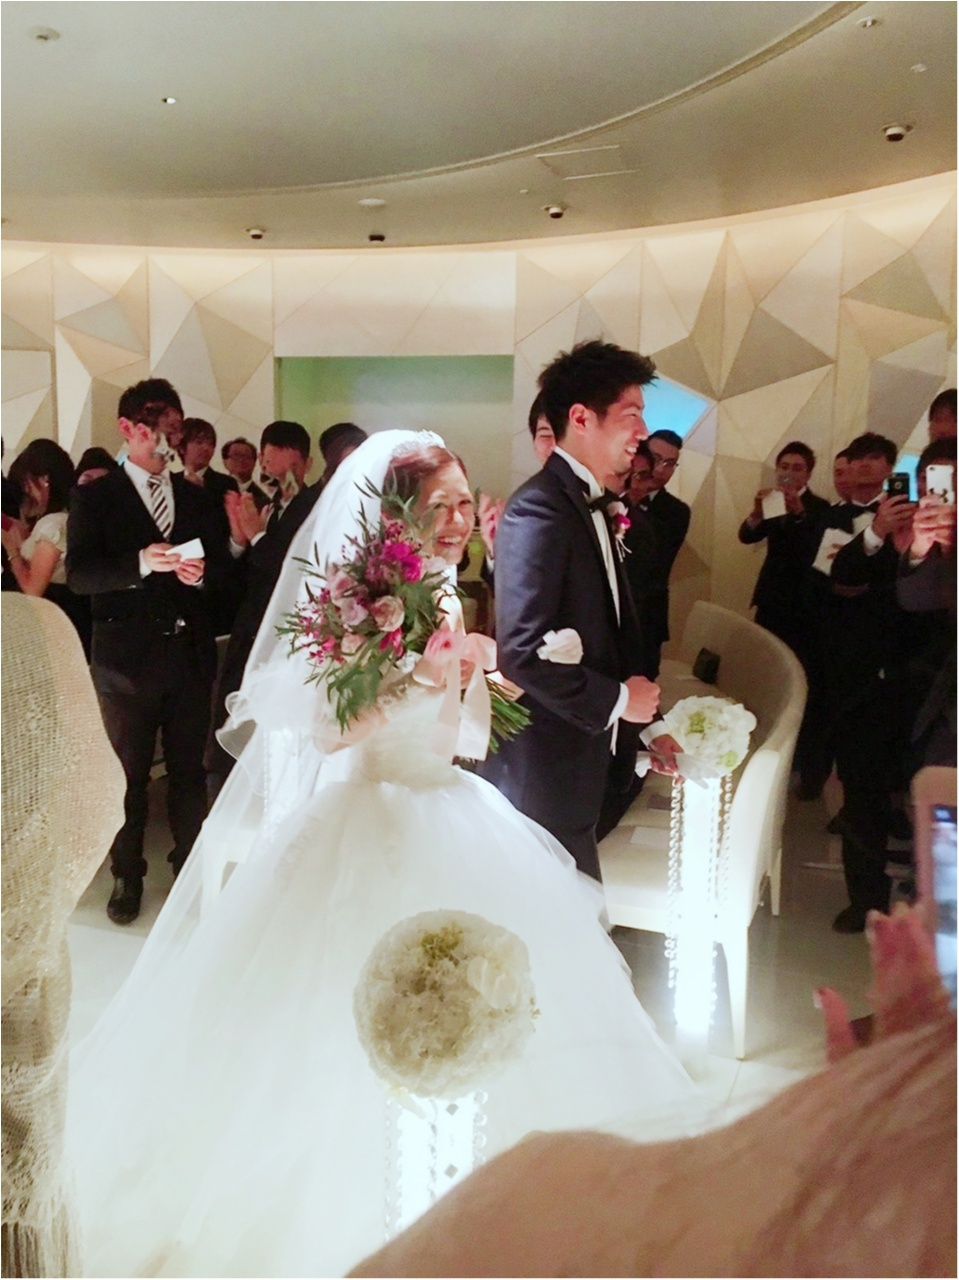 【justmarried】大好きな方々に囲まれ、卒花しました!!_1